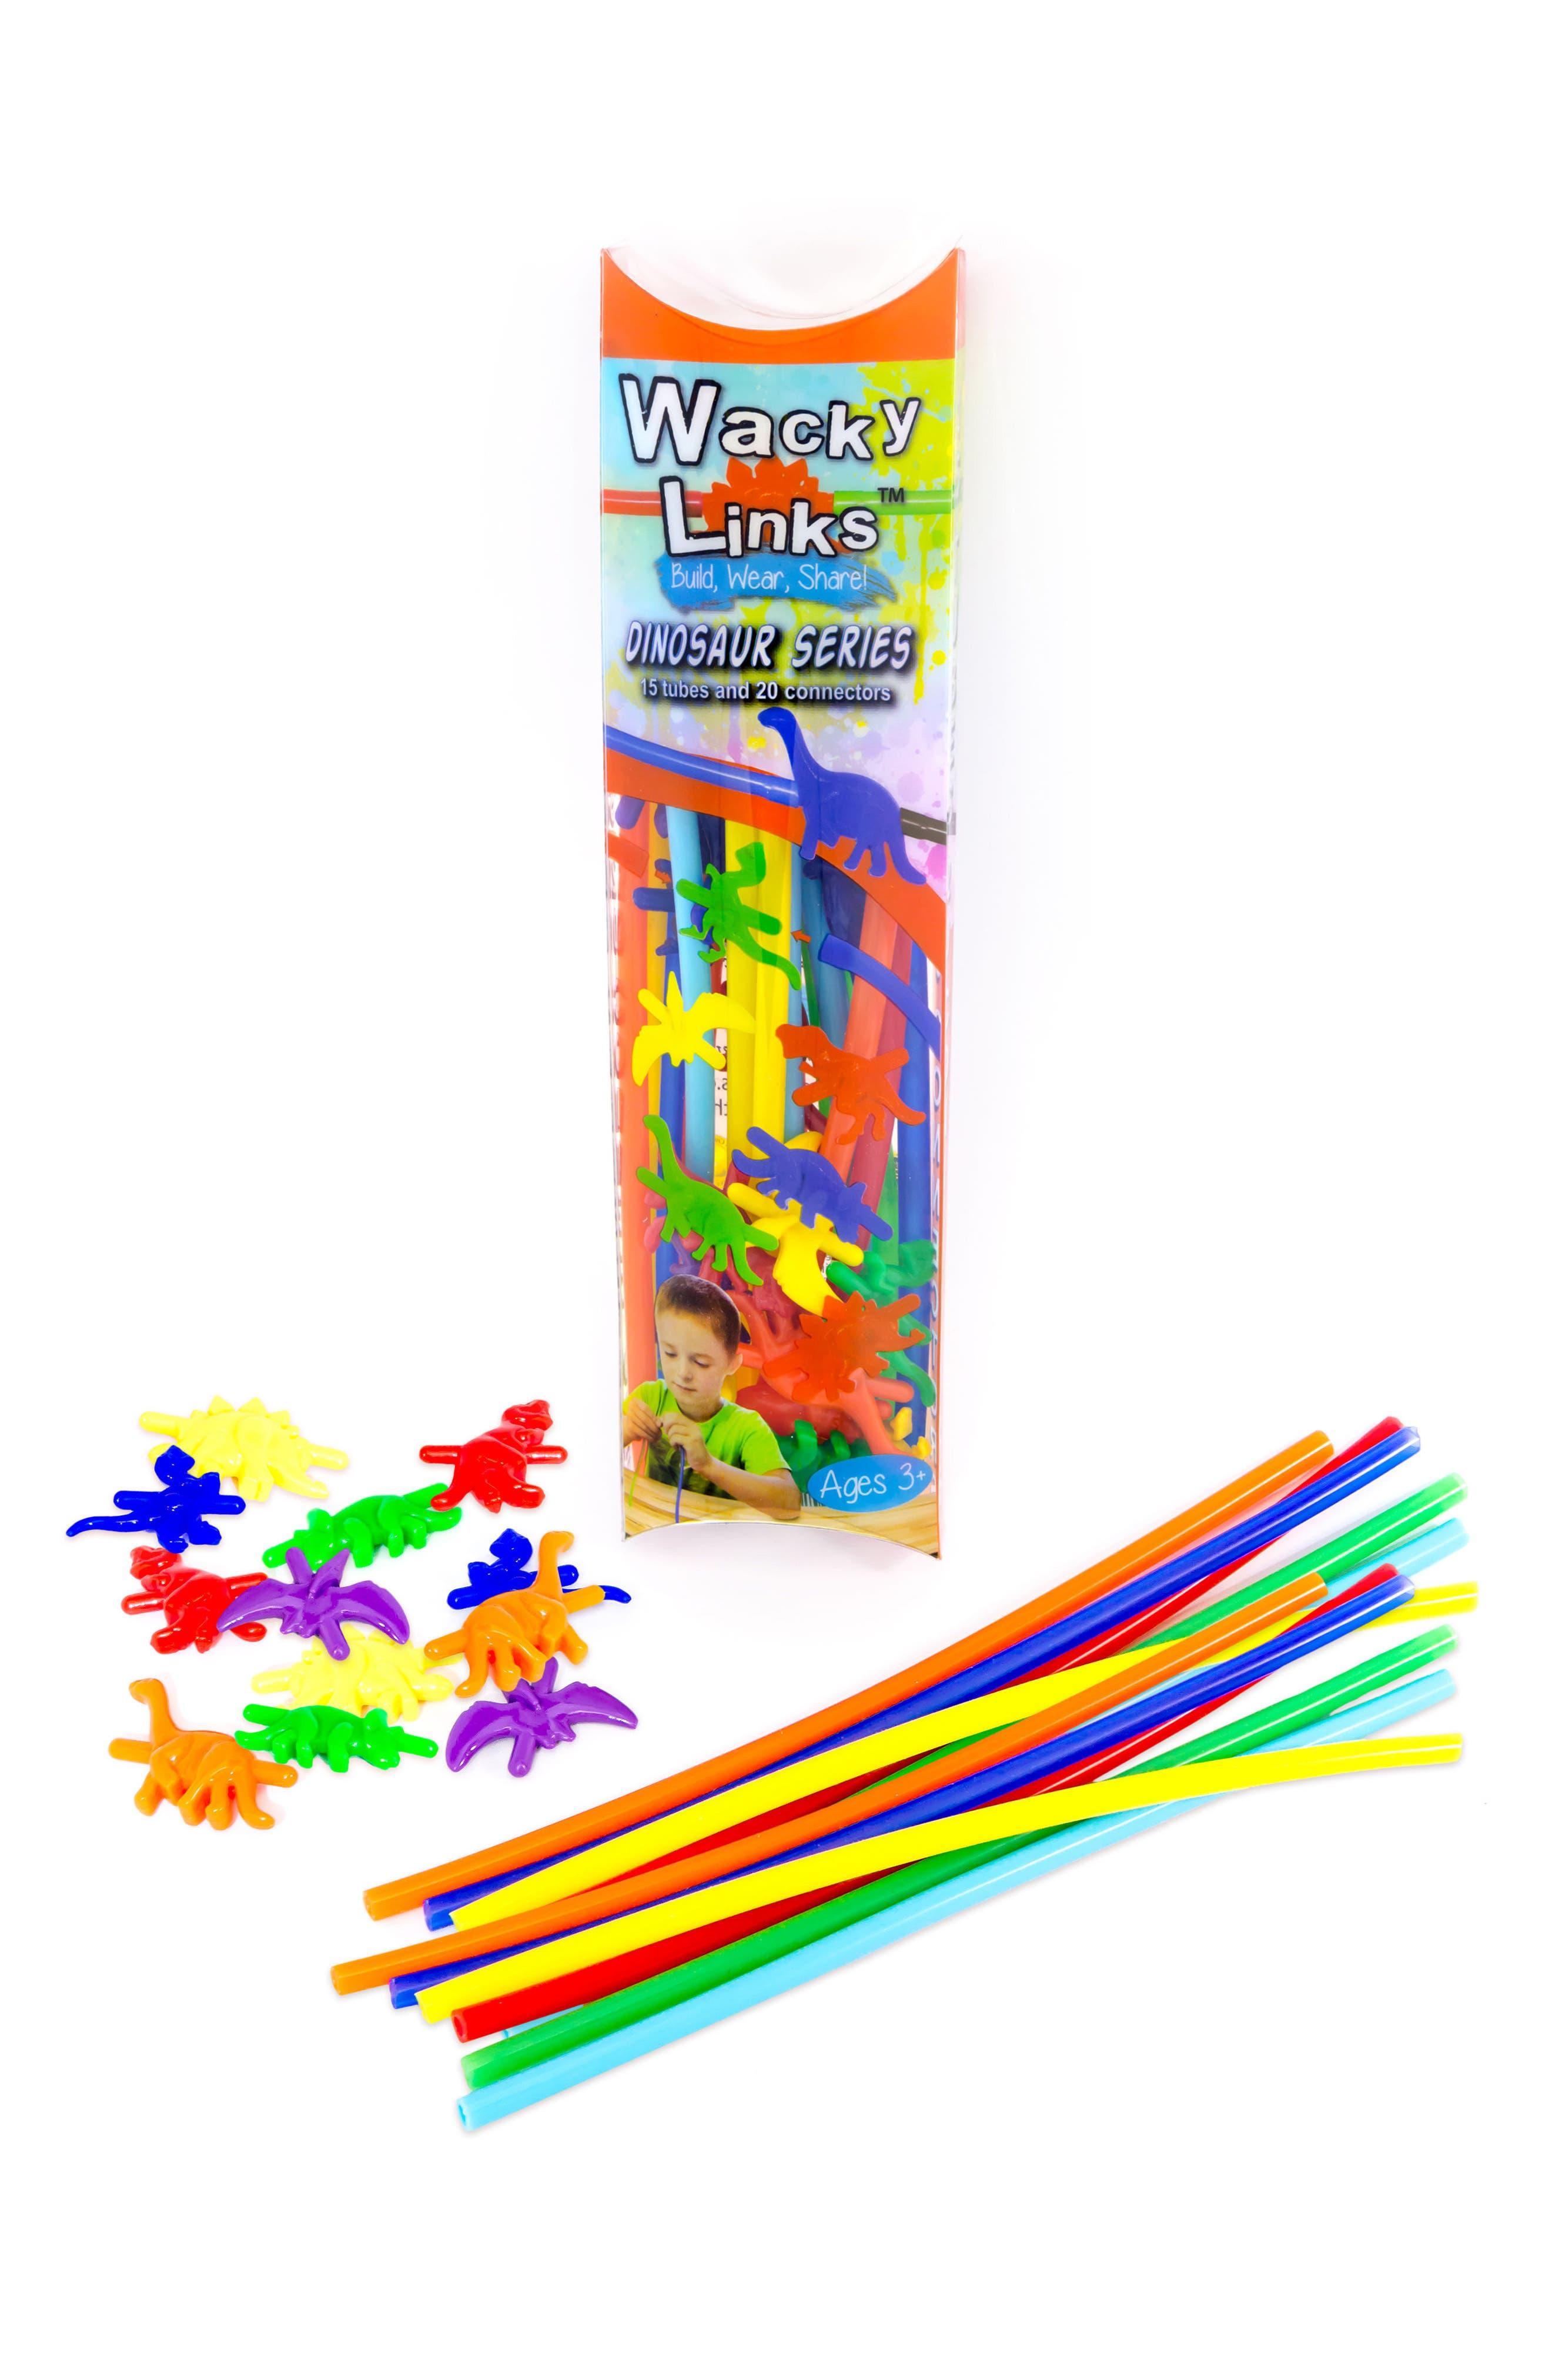 Wacky Links 35-Piece Dinosaur Series Linking Toy Kit